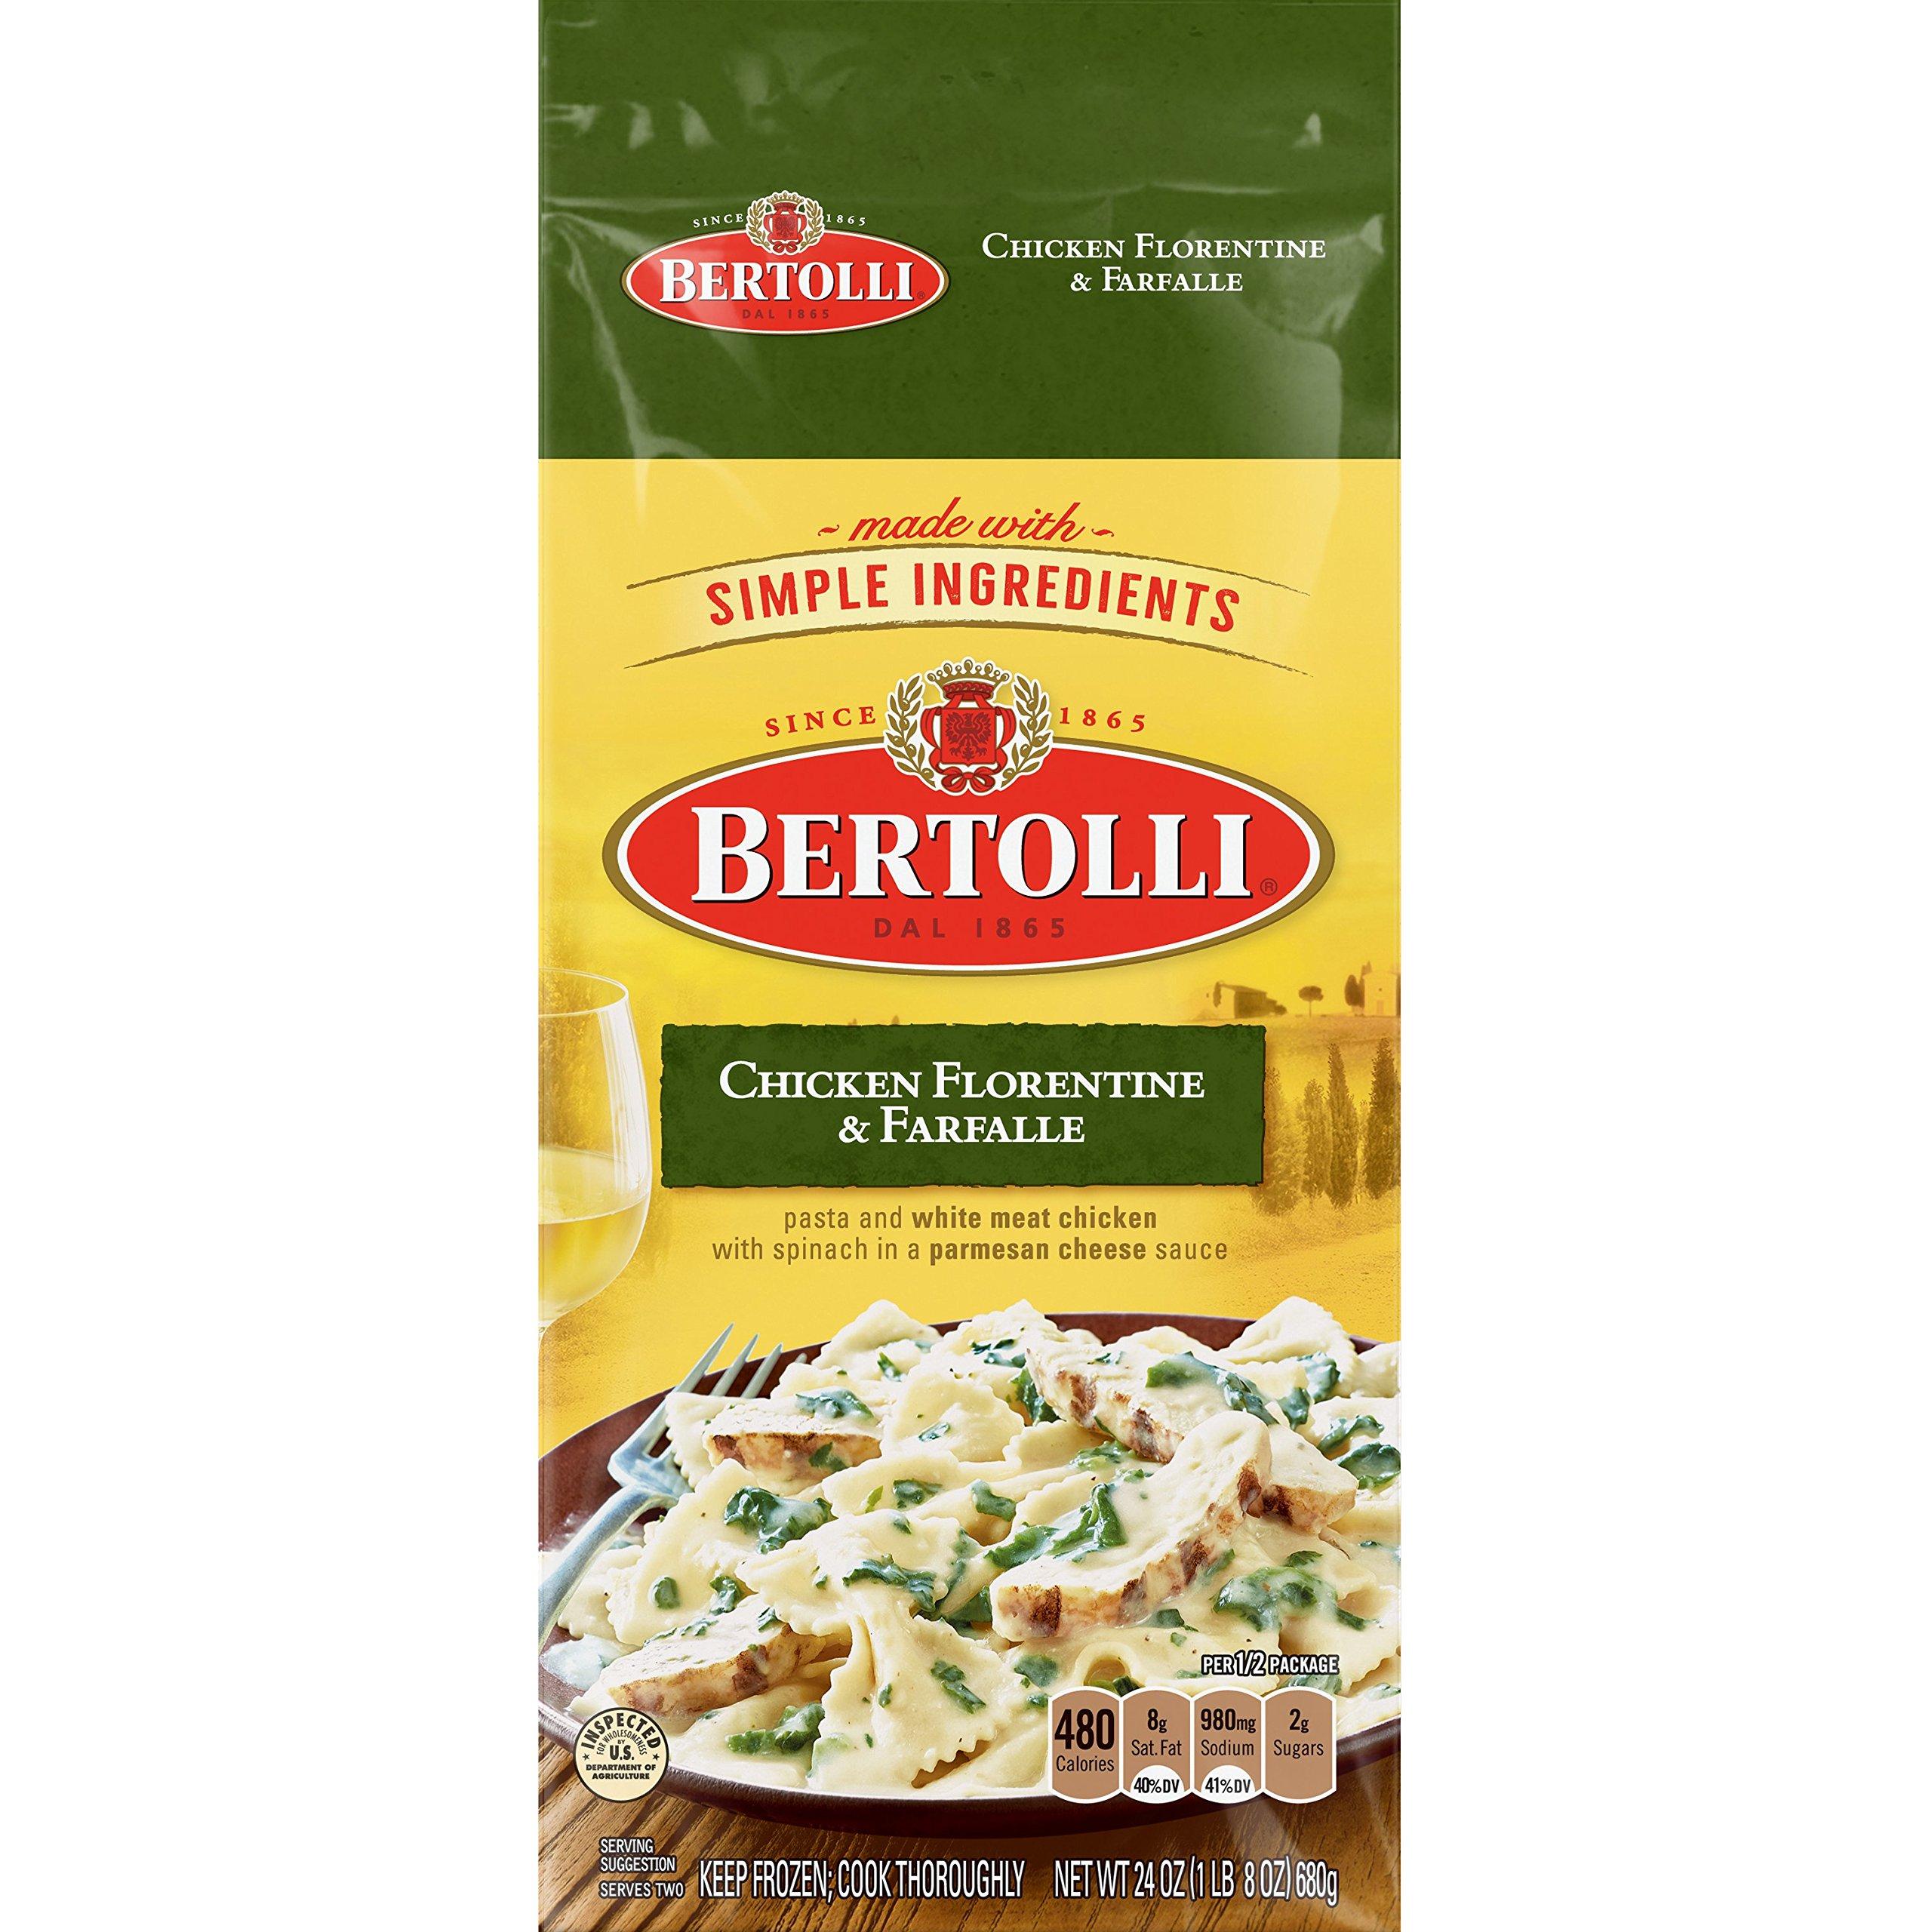 Bertolli, Classic Meal for 2 Chicken Florentine & Farfalle, 24 oz (Frozen)